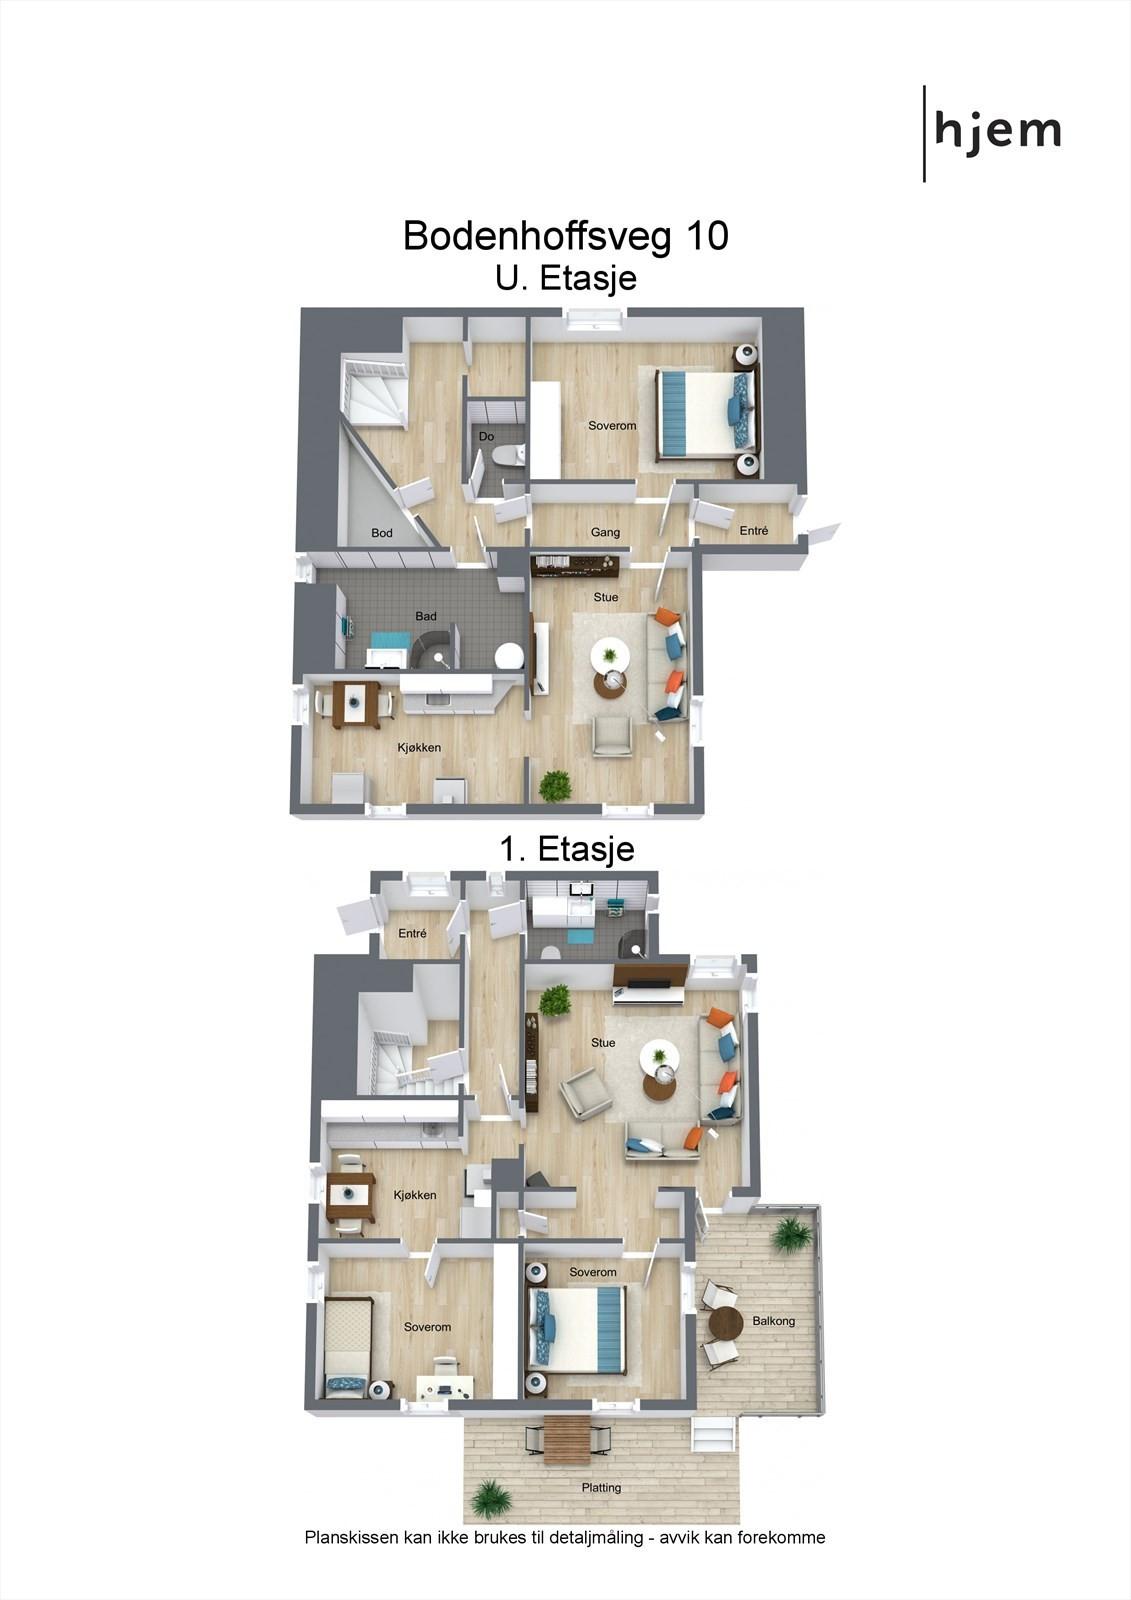 Project letterhead - Bodenhoffsveg 10 - 3D Floor Plan.jpg